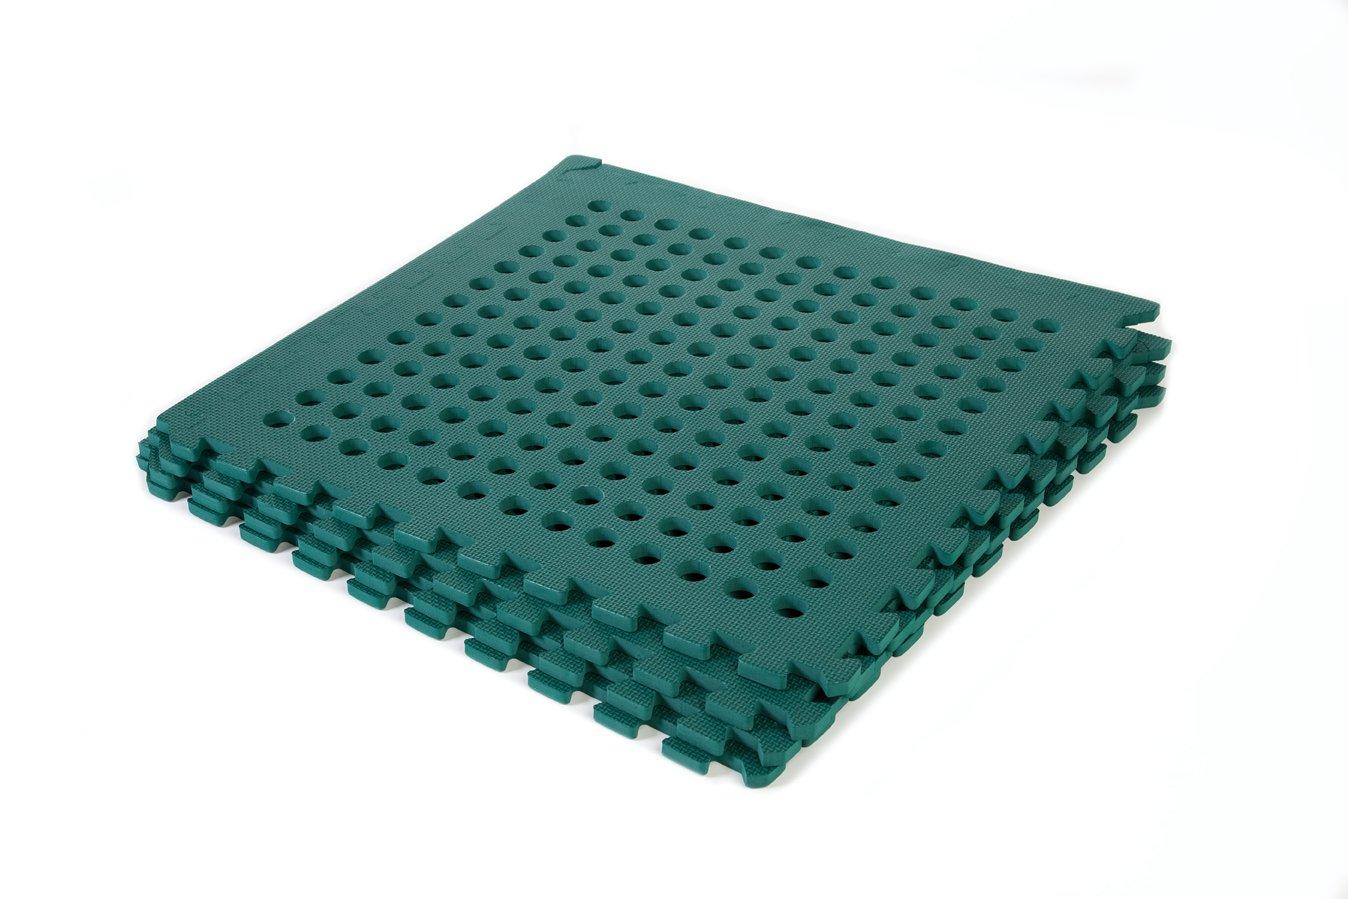 Garden Safety Green Mats 64sq ft Keasimat branded mats Amazonco